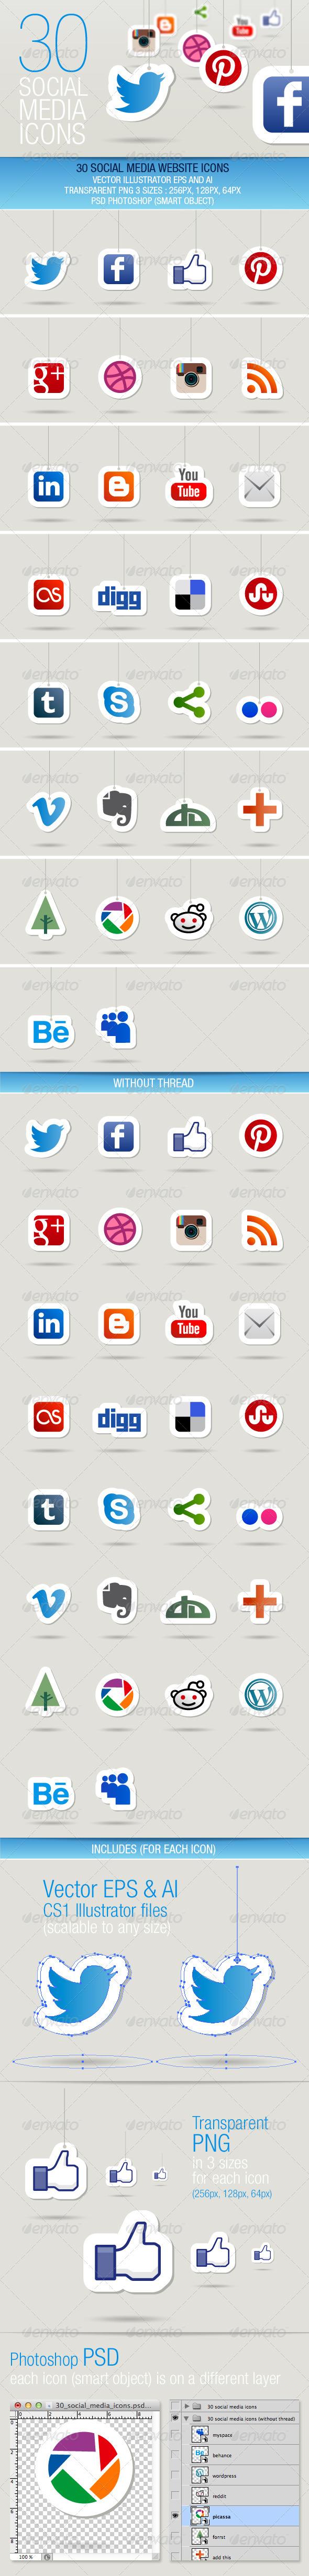 GraphicRiver 30 Social Media Icons 3606020